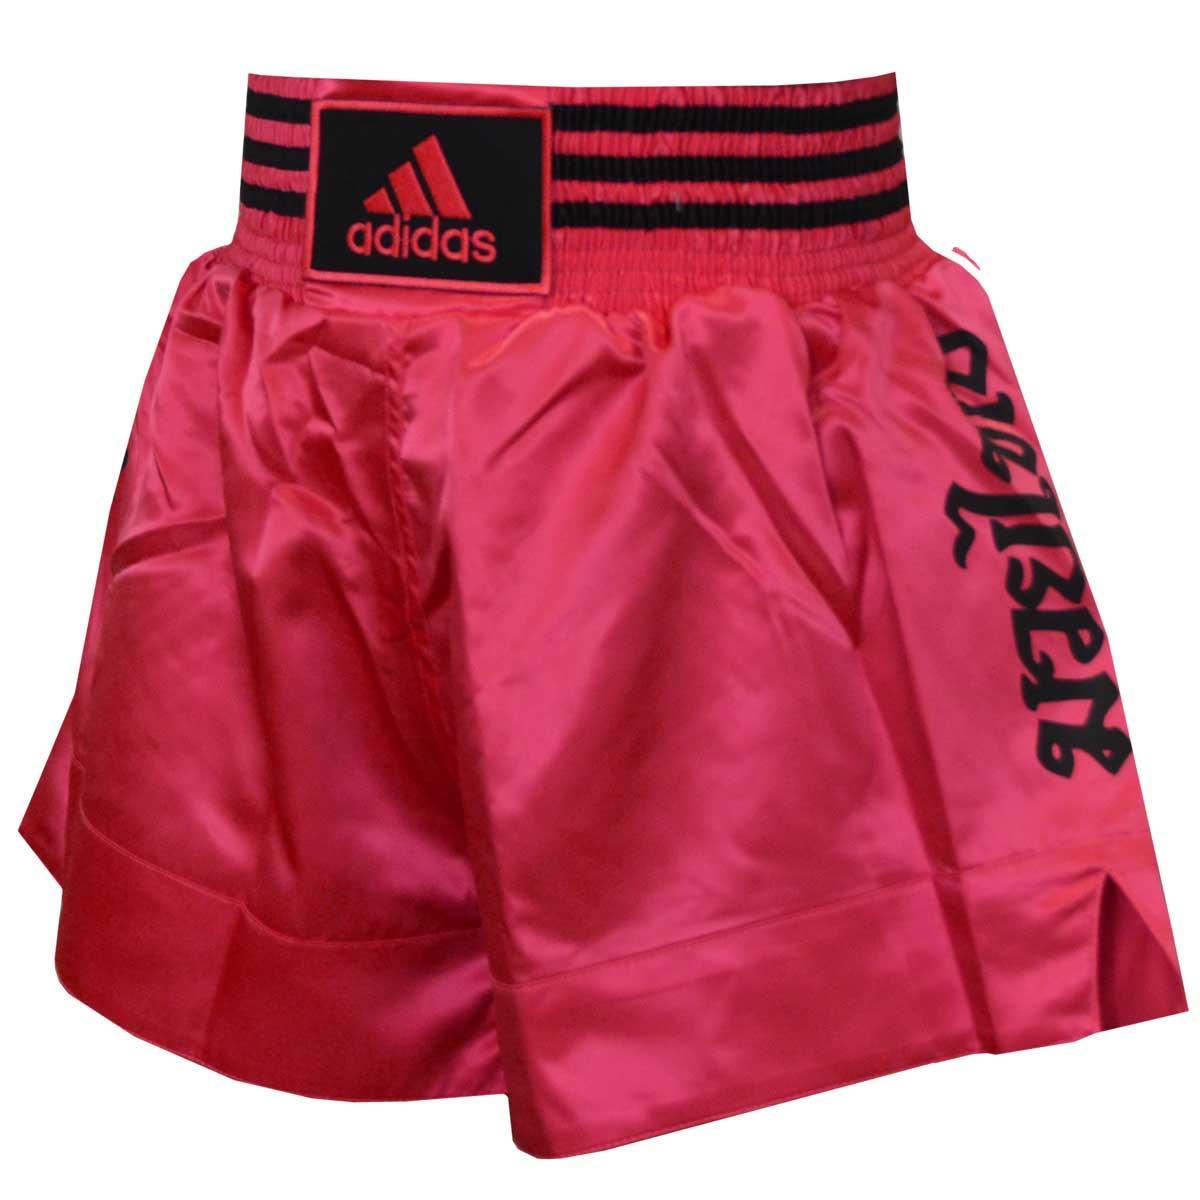 Pantaloncini  ADIDAS Muai Thai, Boxe,  Kickboxing, Donna